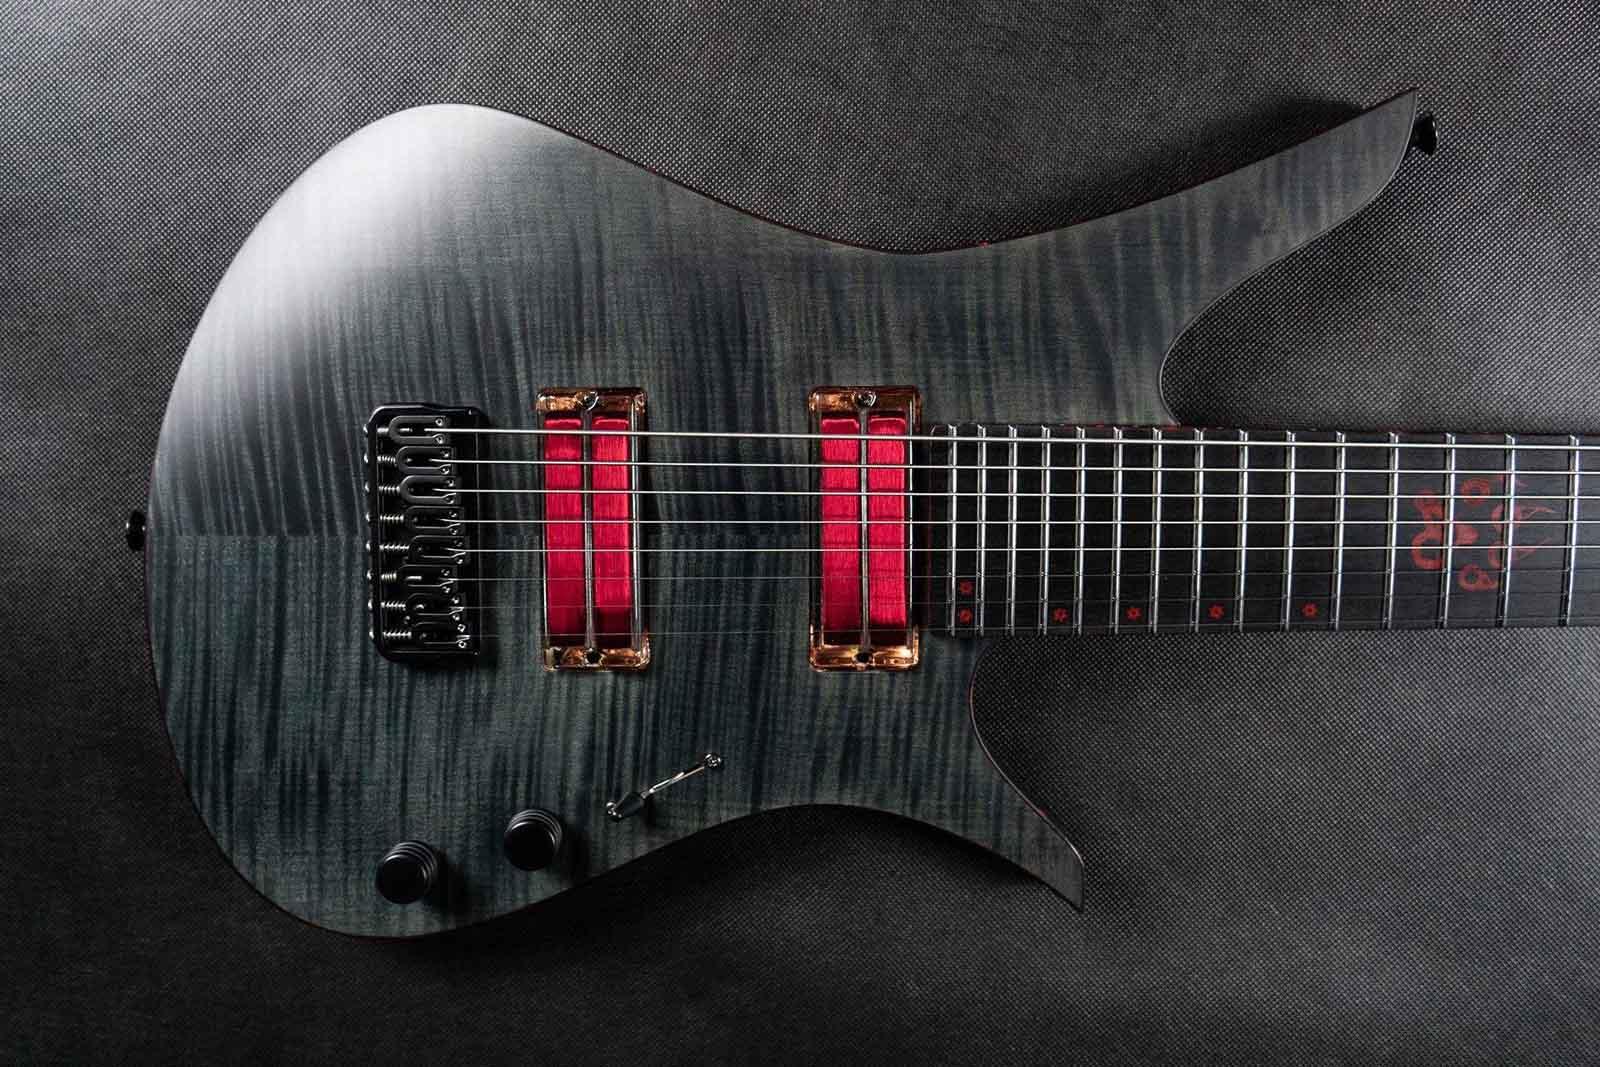 Beautiful Blackat guitar made by Tomek Sławiński with transparent neodymium q-tuners q2.0 neodymium pickups